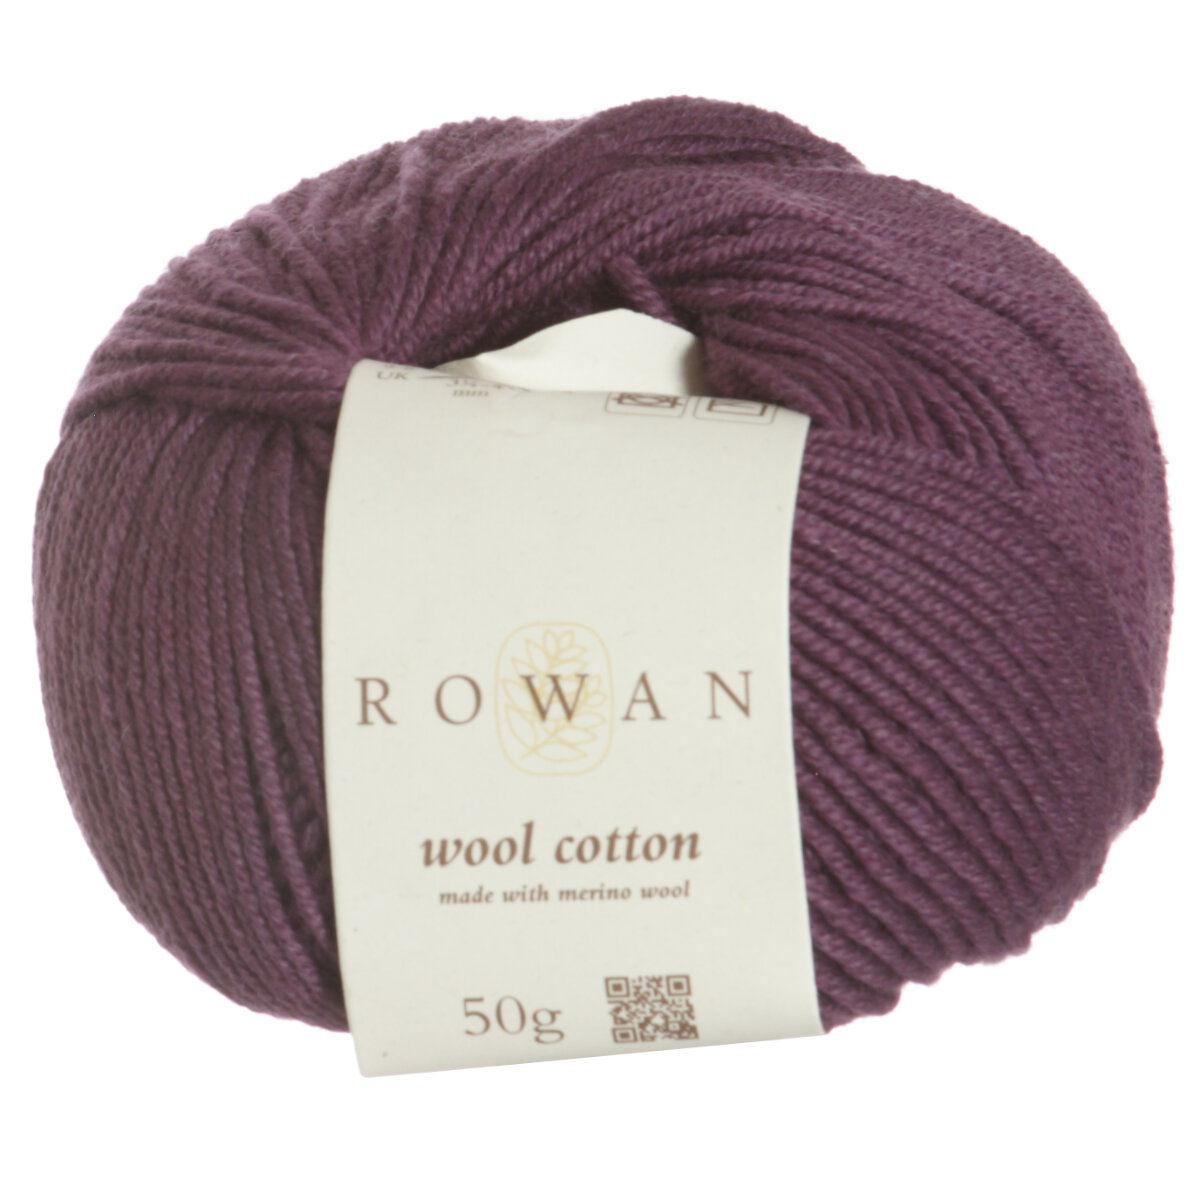 Knitting Patterns Rowan Wool Cotton : Rowan Wool Cotton Yarn - 969 - Bilberry Reviews at Jimmy Beans Wool